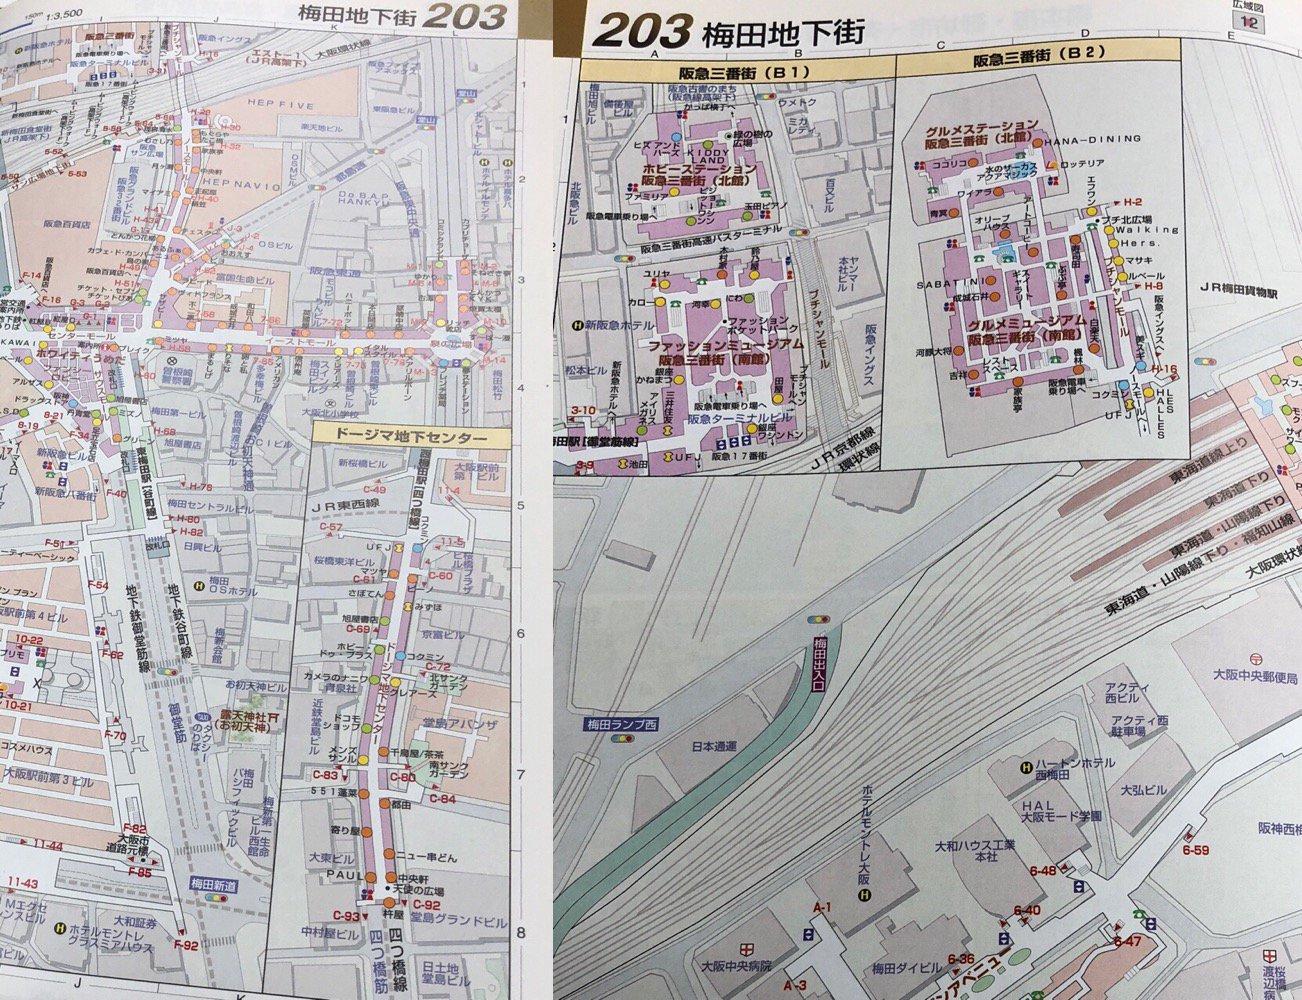 梅田地下街。  アトラスRDX 関西道路地図 B5 (2004年3月発行) https://t.co/atM71cCRZD